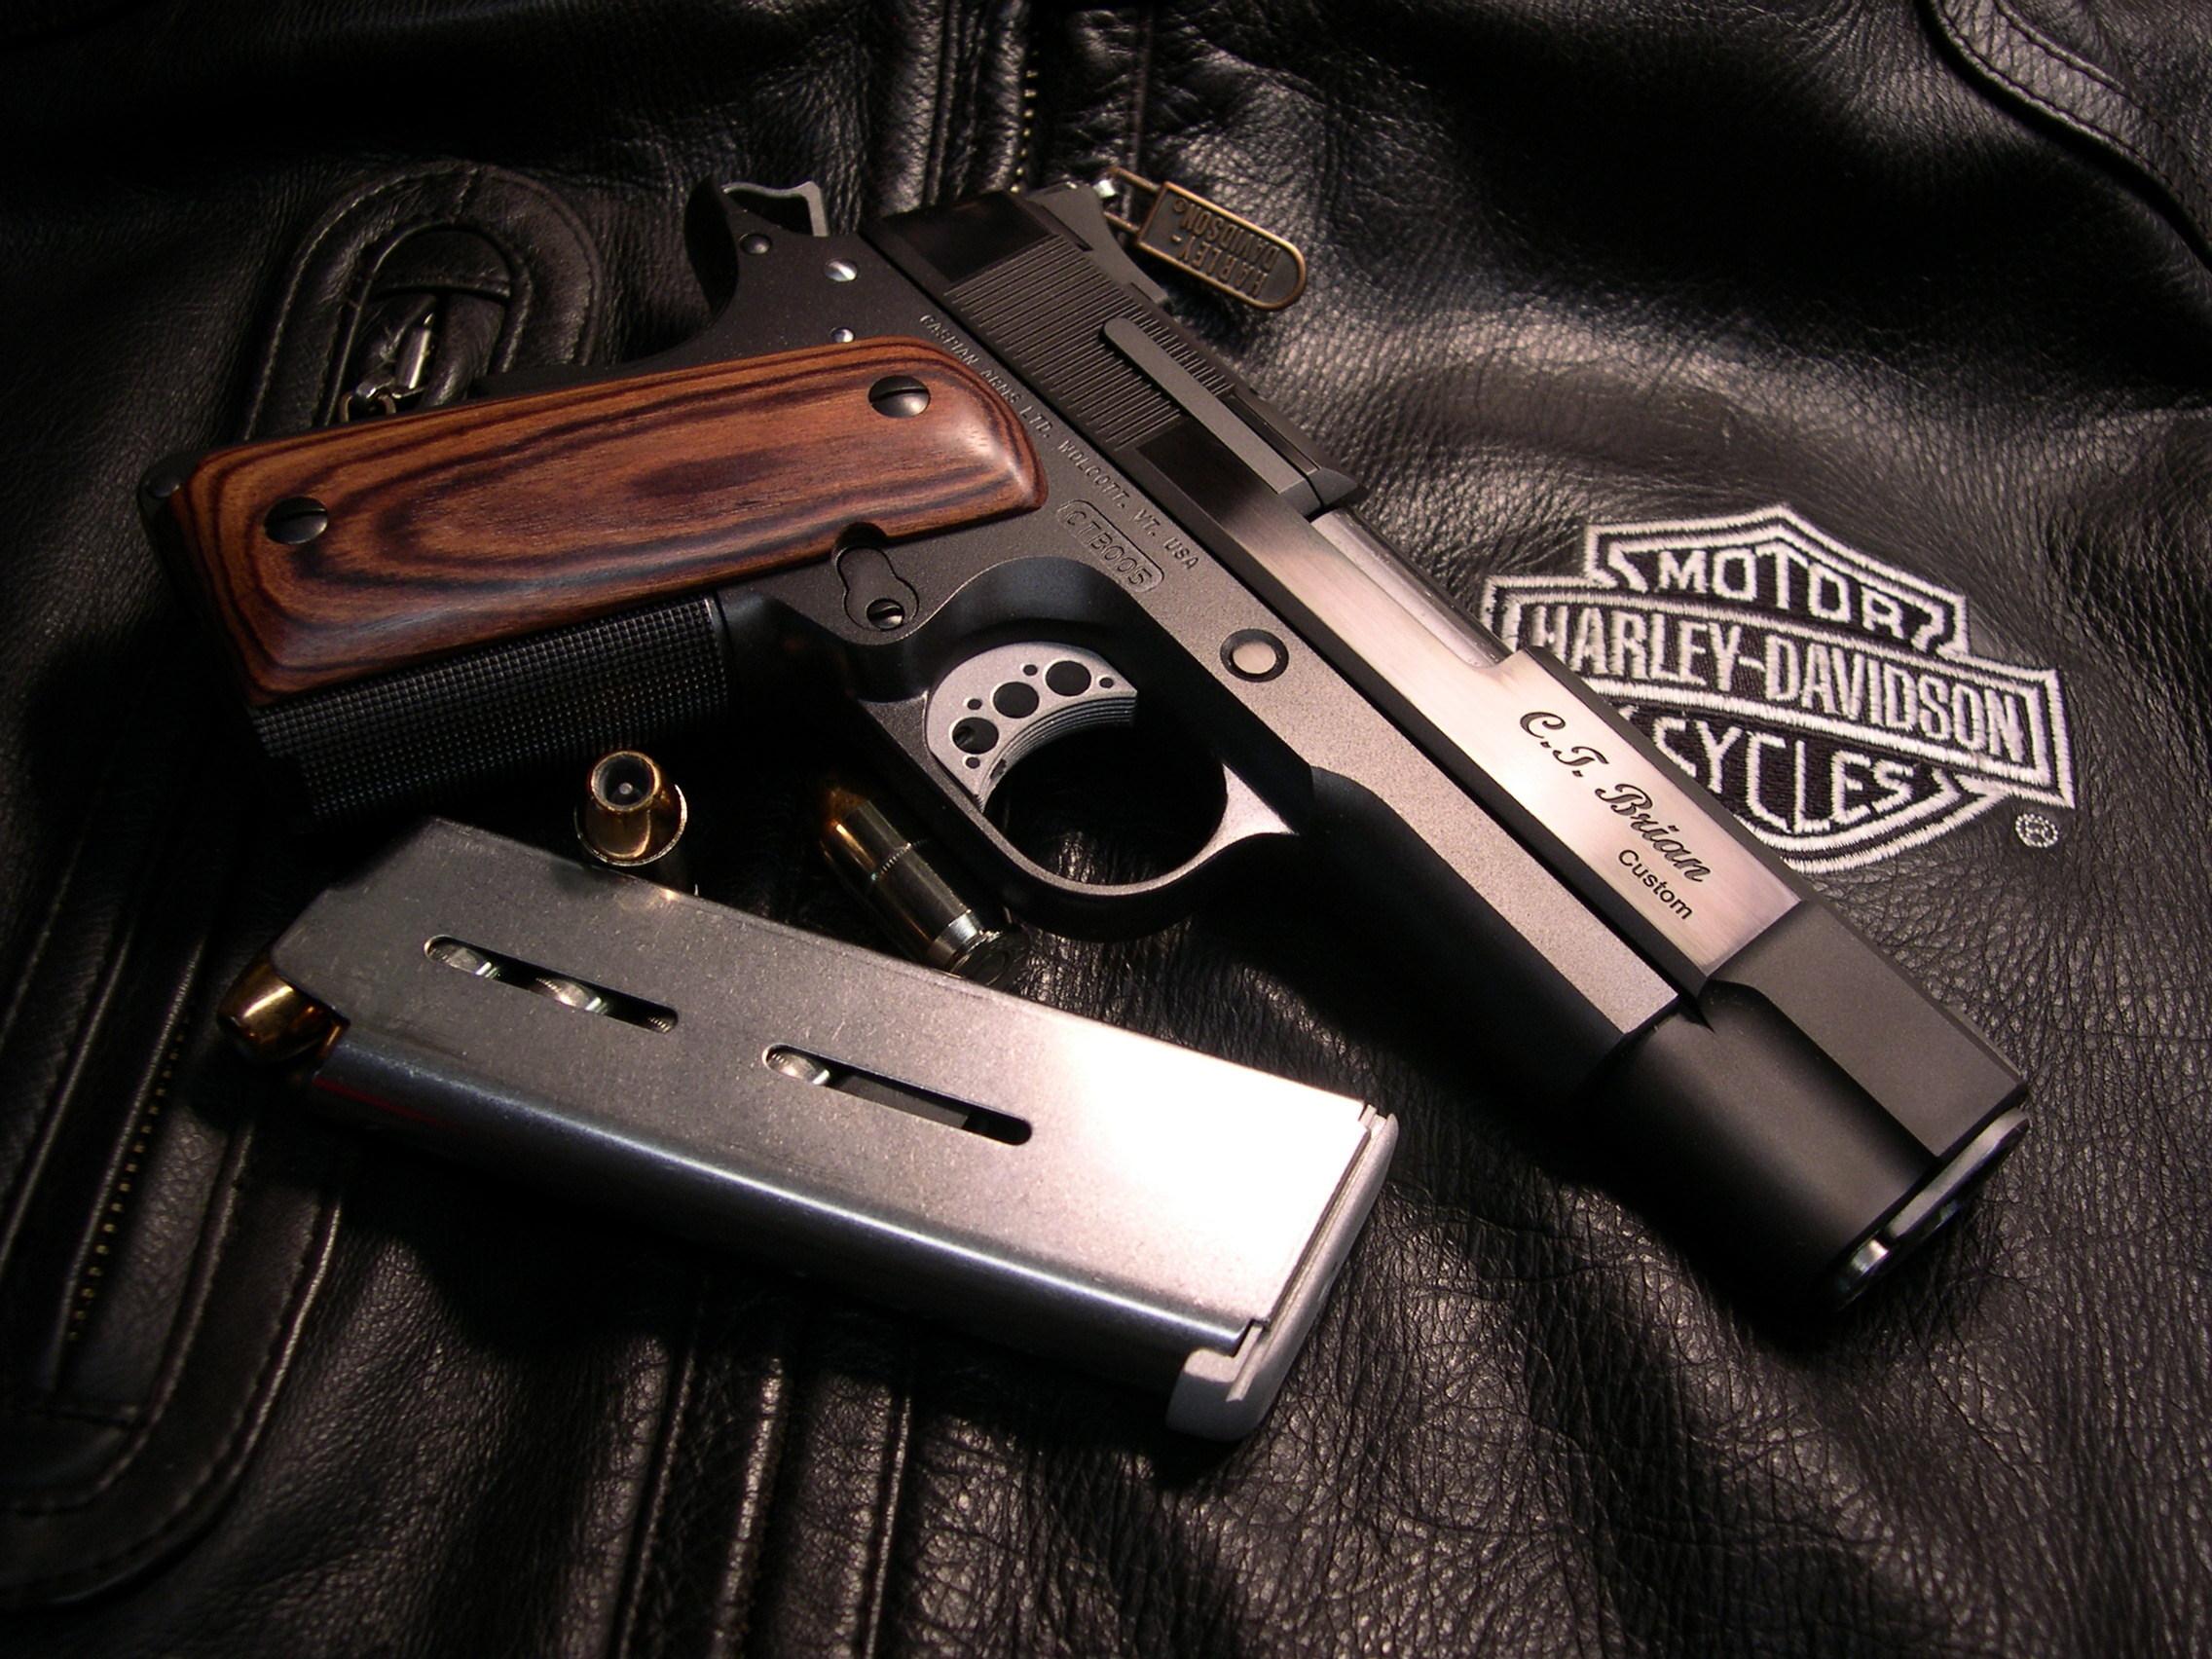 Hd wallpaper gun - Hd Wallpaper Background Id 175573 2272x1704 Weapons Pistol